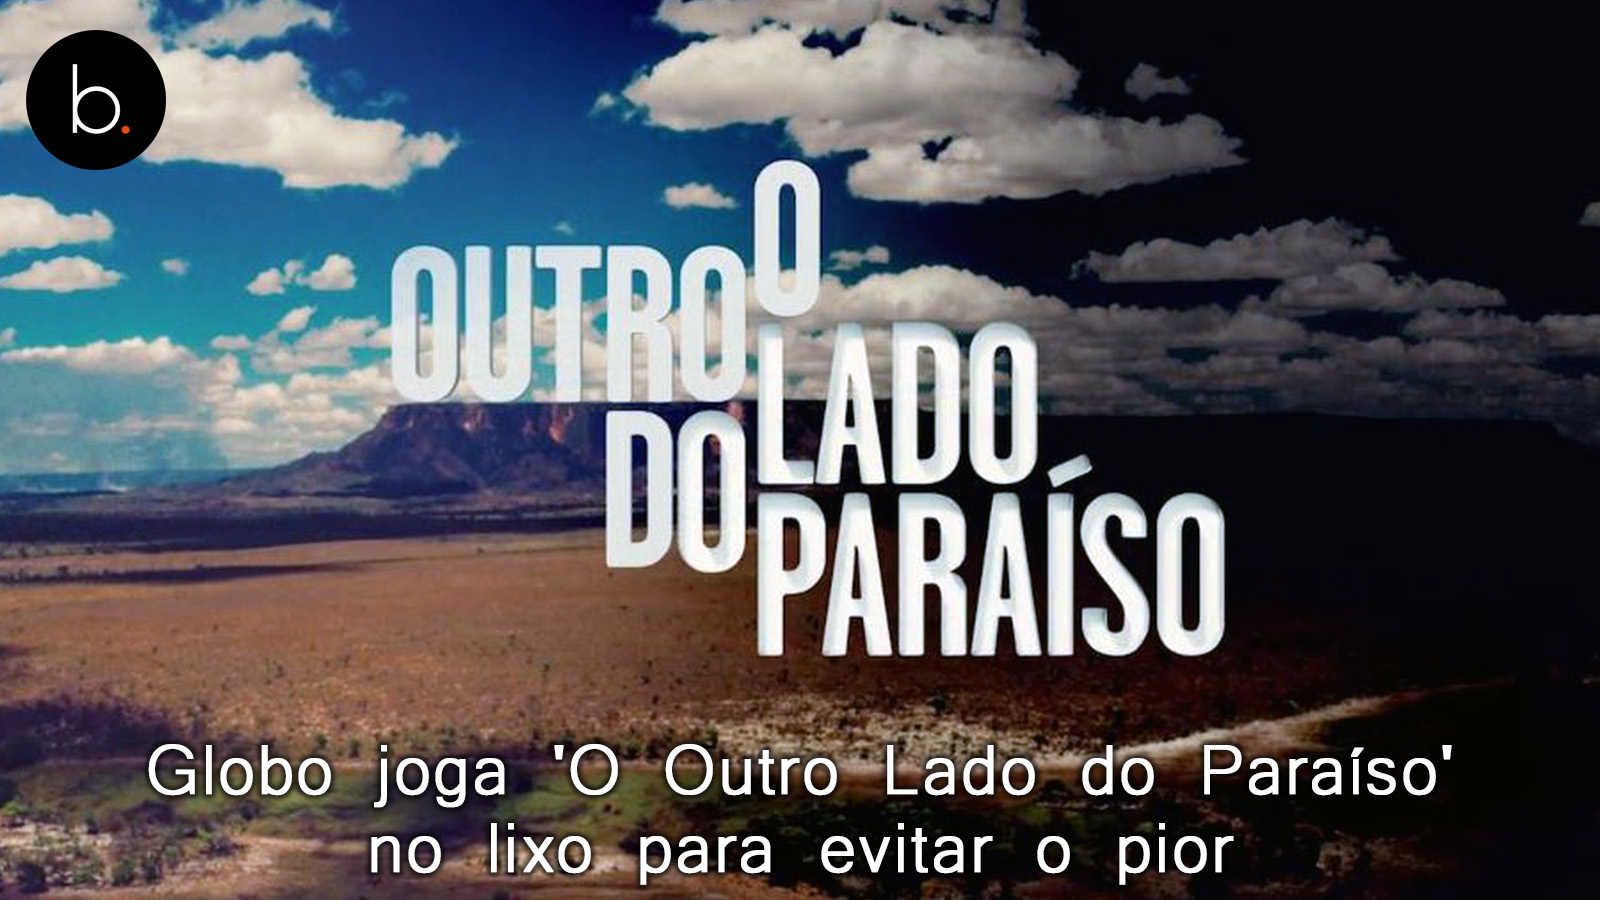 Globo joga 'O Outro Lado do Paraíso' no lixo para evitar o pior